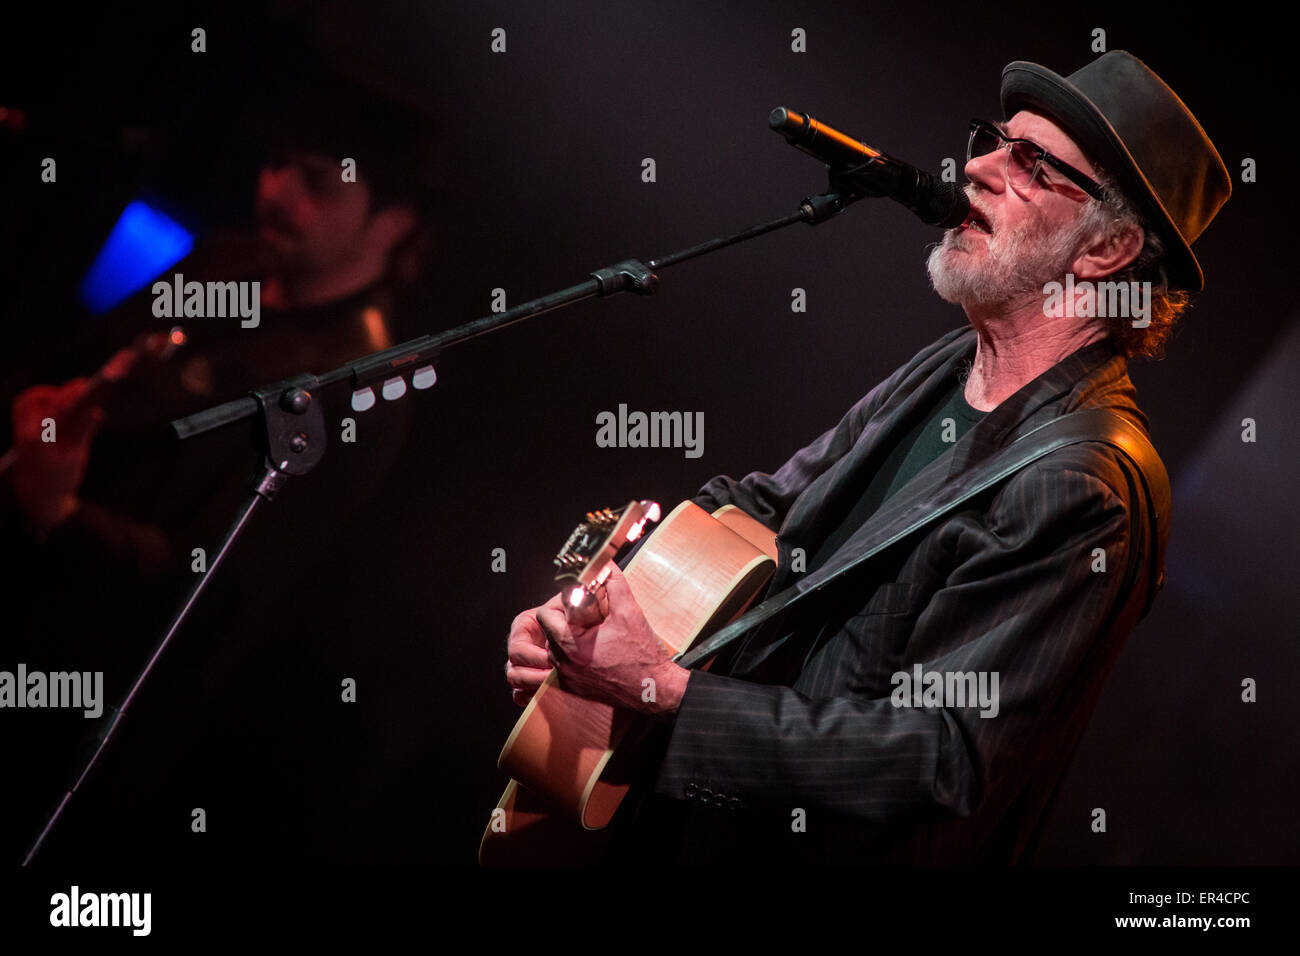 Varese Italy. 26 May 2015. The Italian singer/songwriter FRANCESCO DE GREGORI performs live at Teatro di Varese Stock Photo